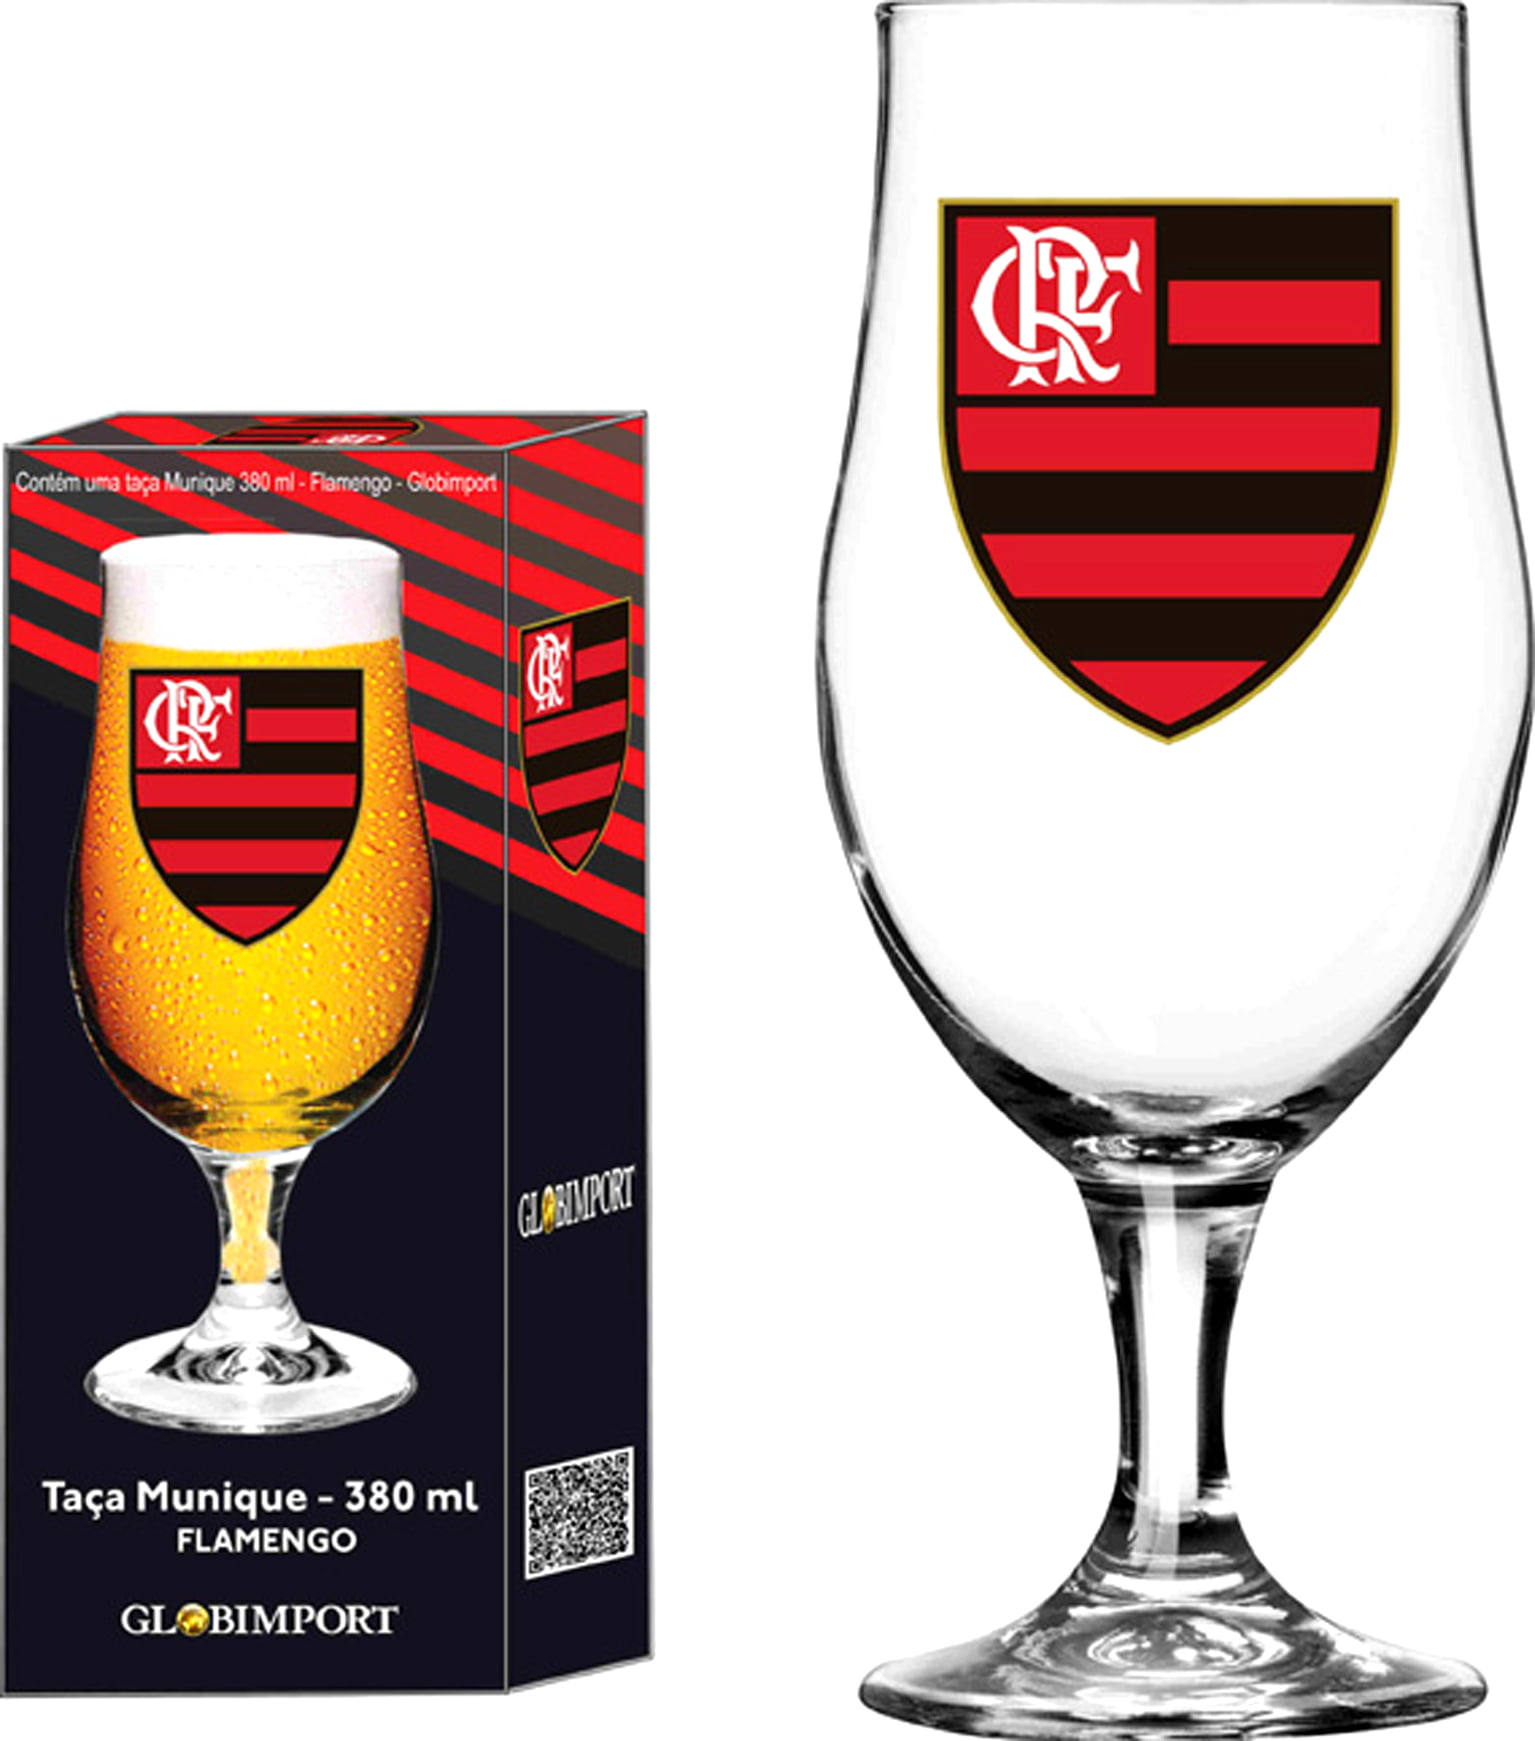 Taça Munique 380ml Flamengo Logo